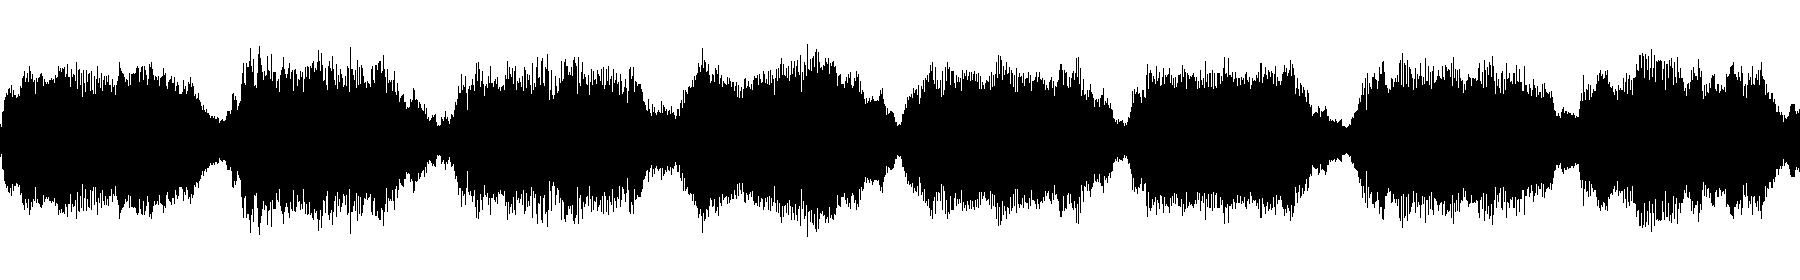 pad3 125